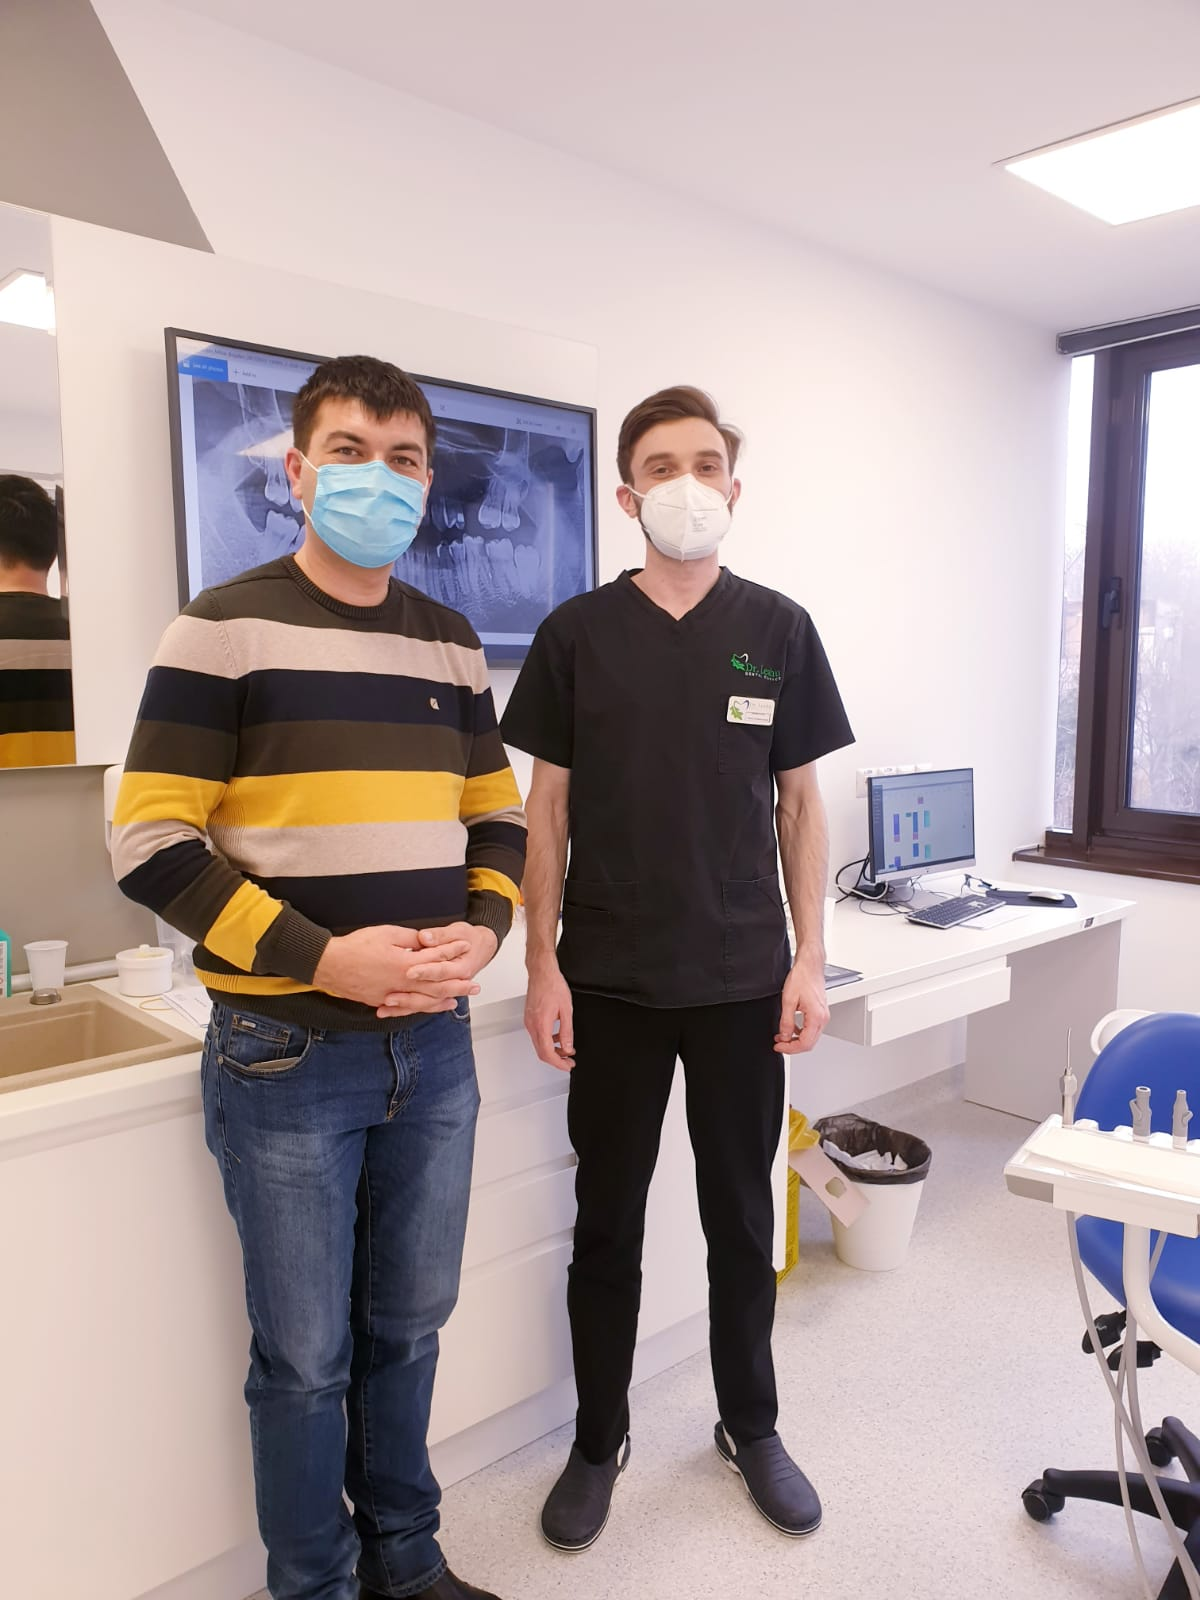 Medic clinicile Dr. Leahu Iasi in dreapta, pacient in stanga